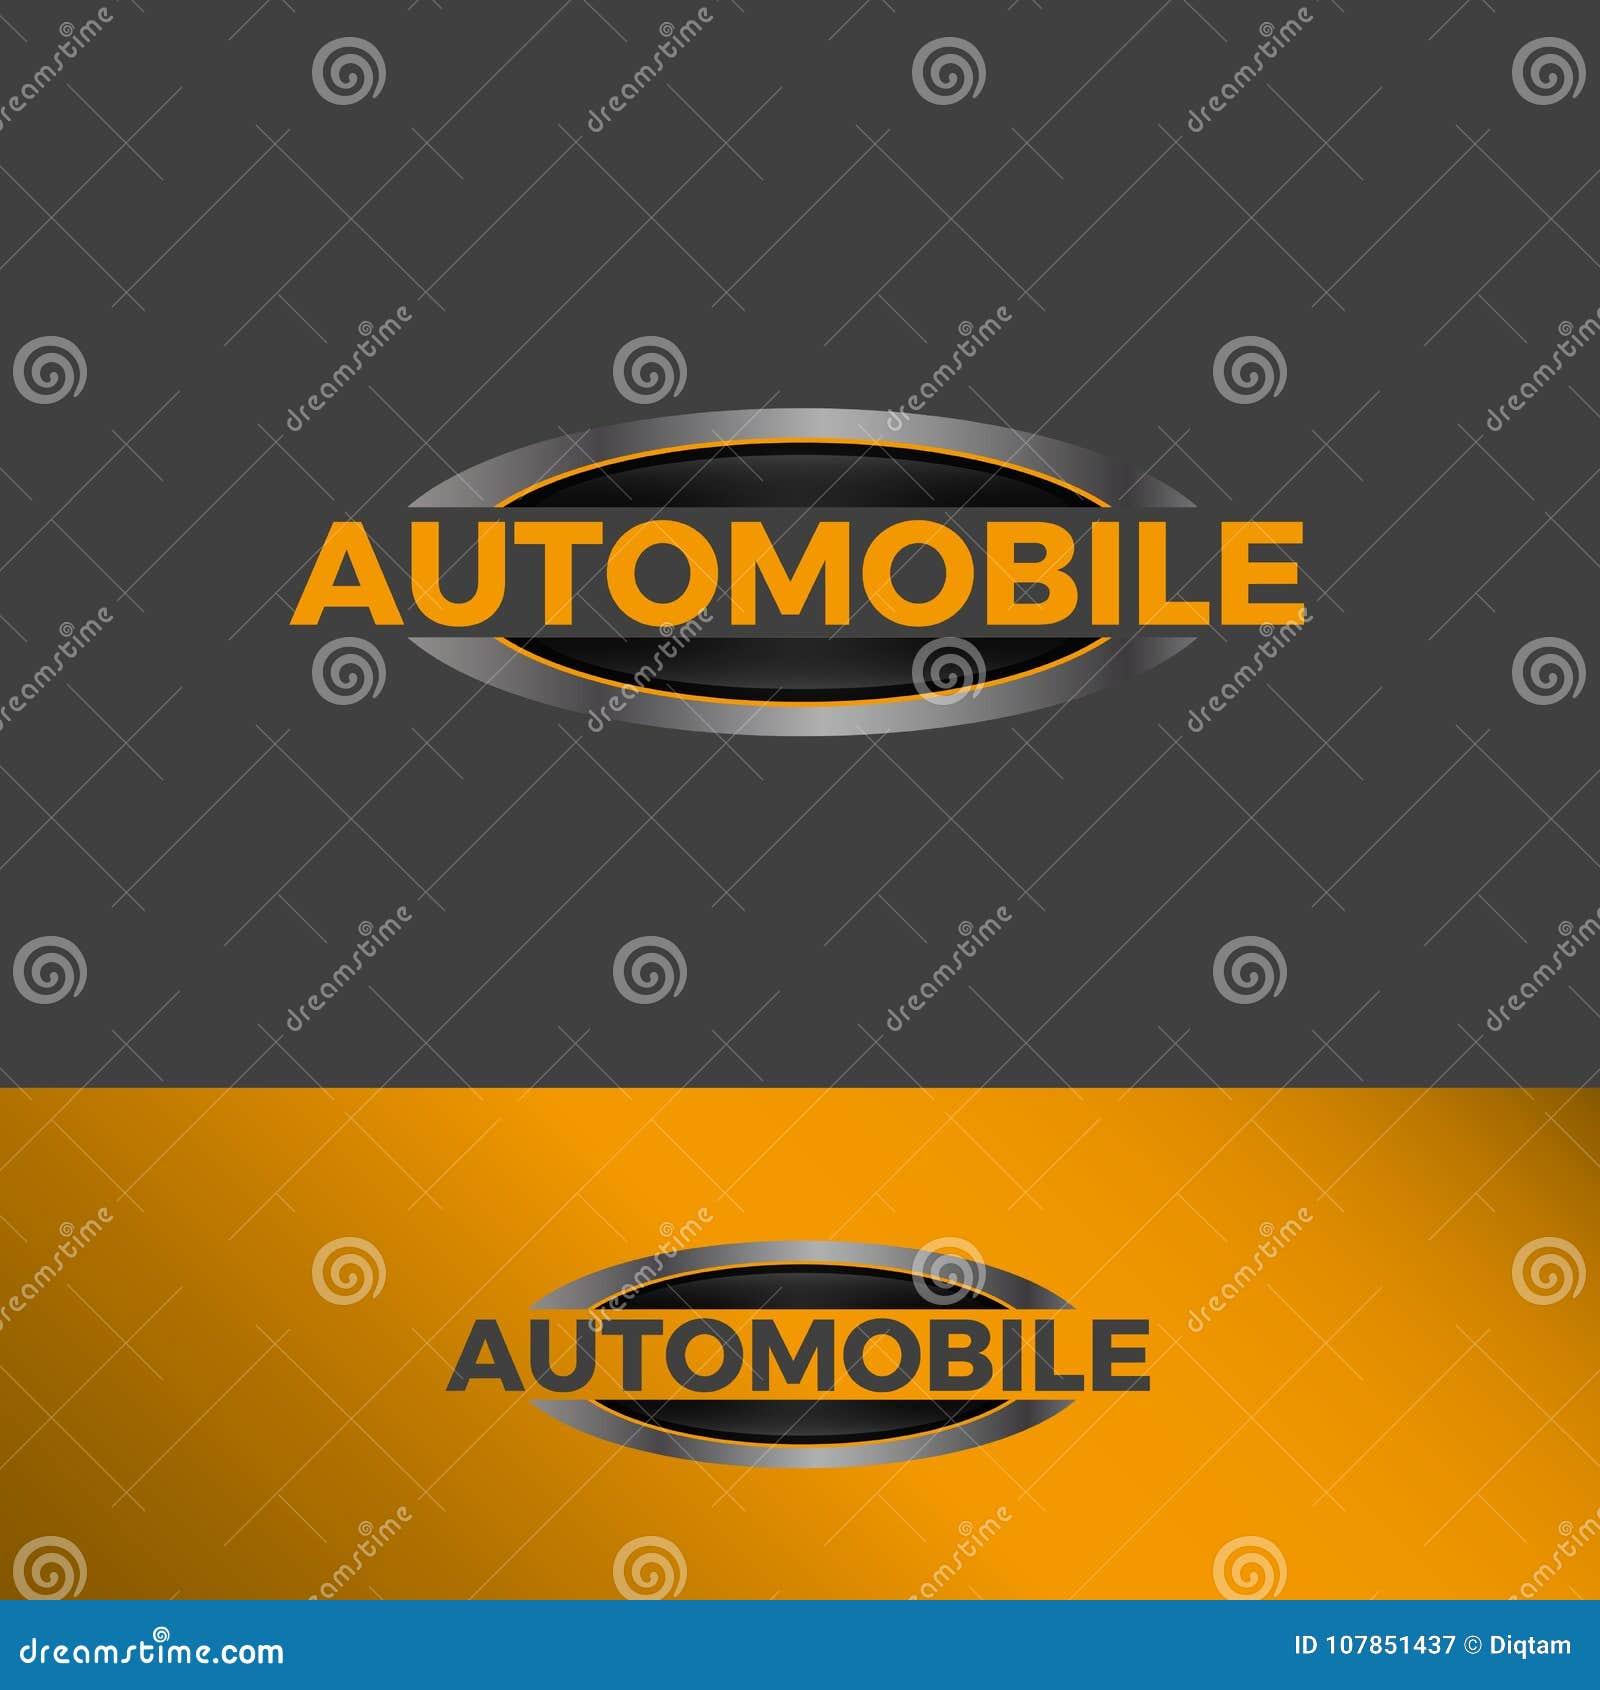 Ellipse Strong Bold logo stock vector. Illustration of automotive ...